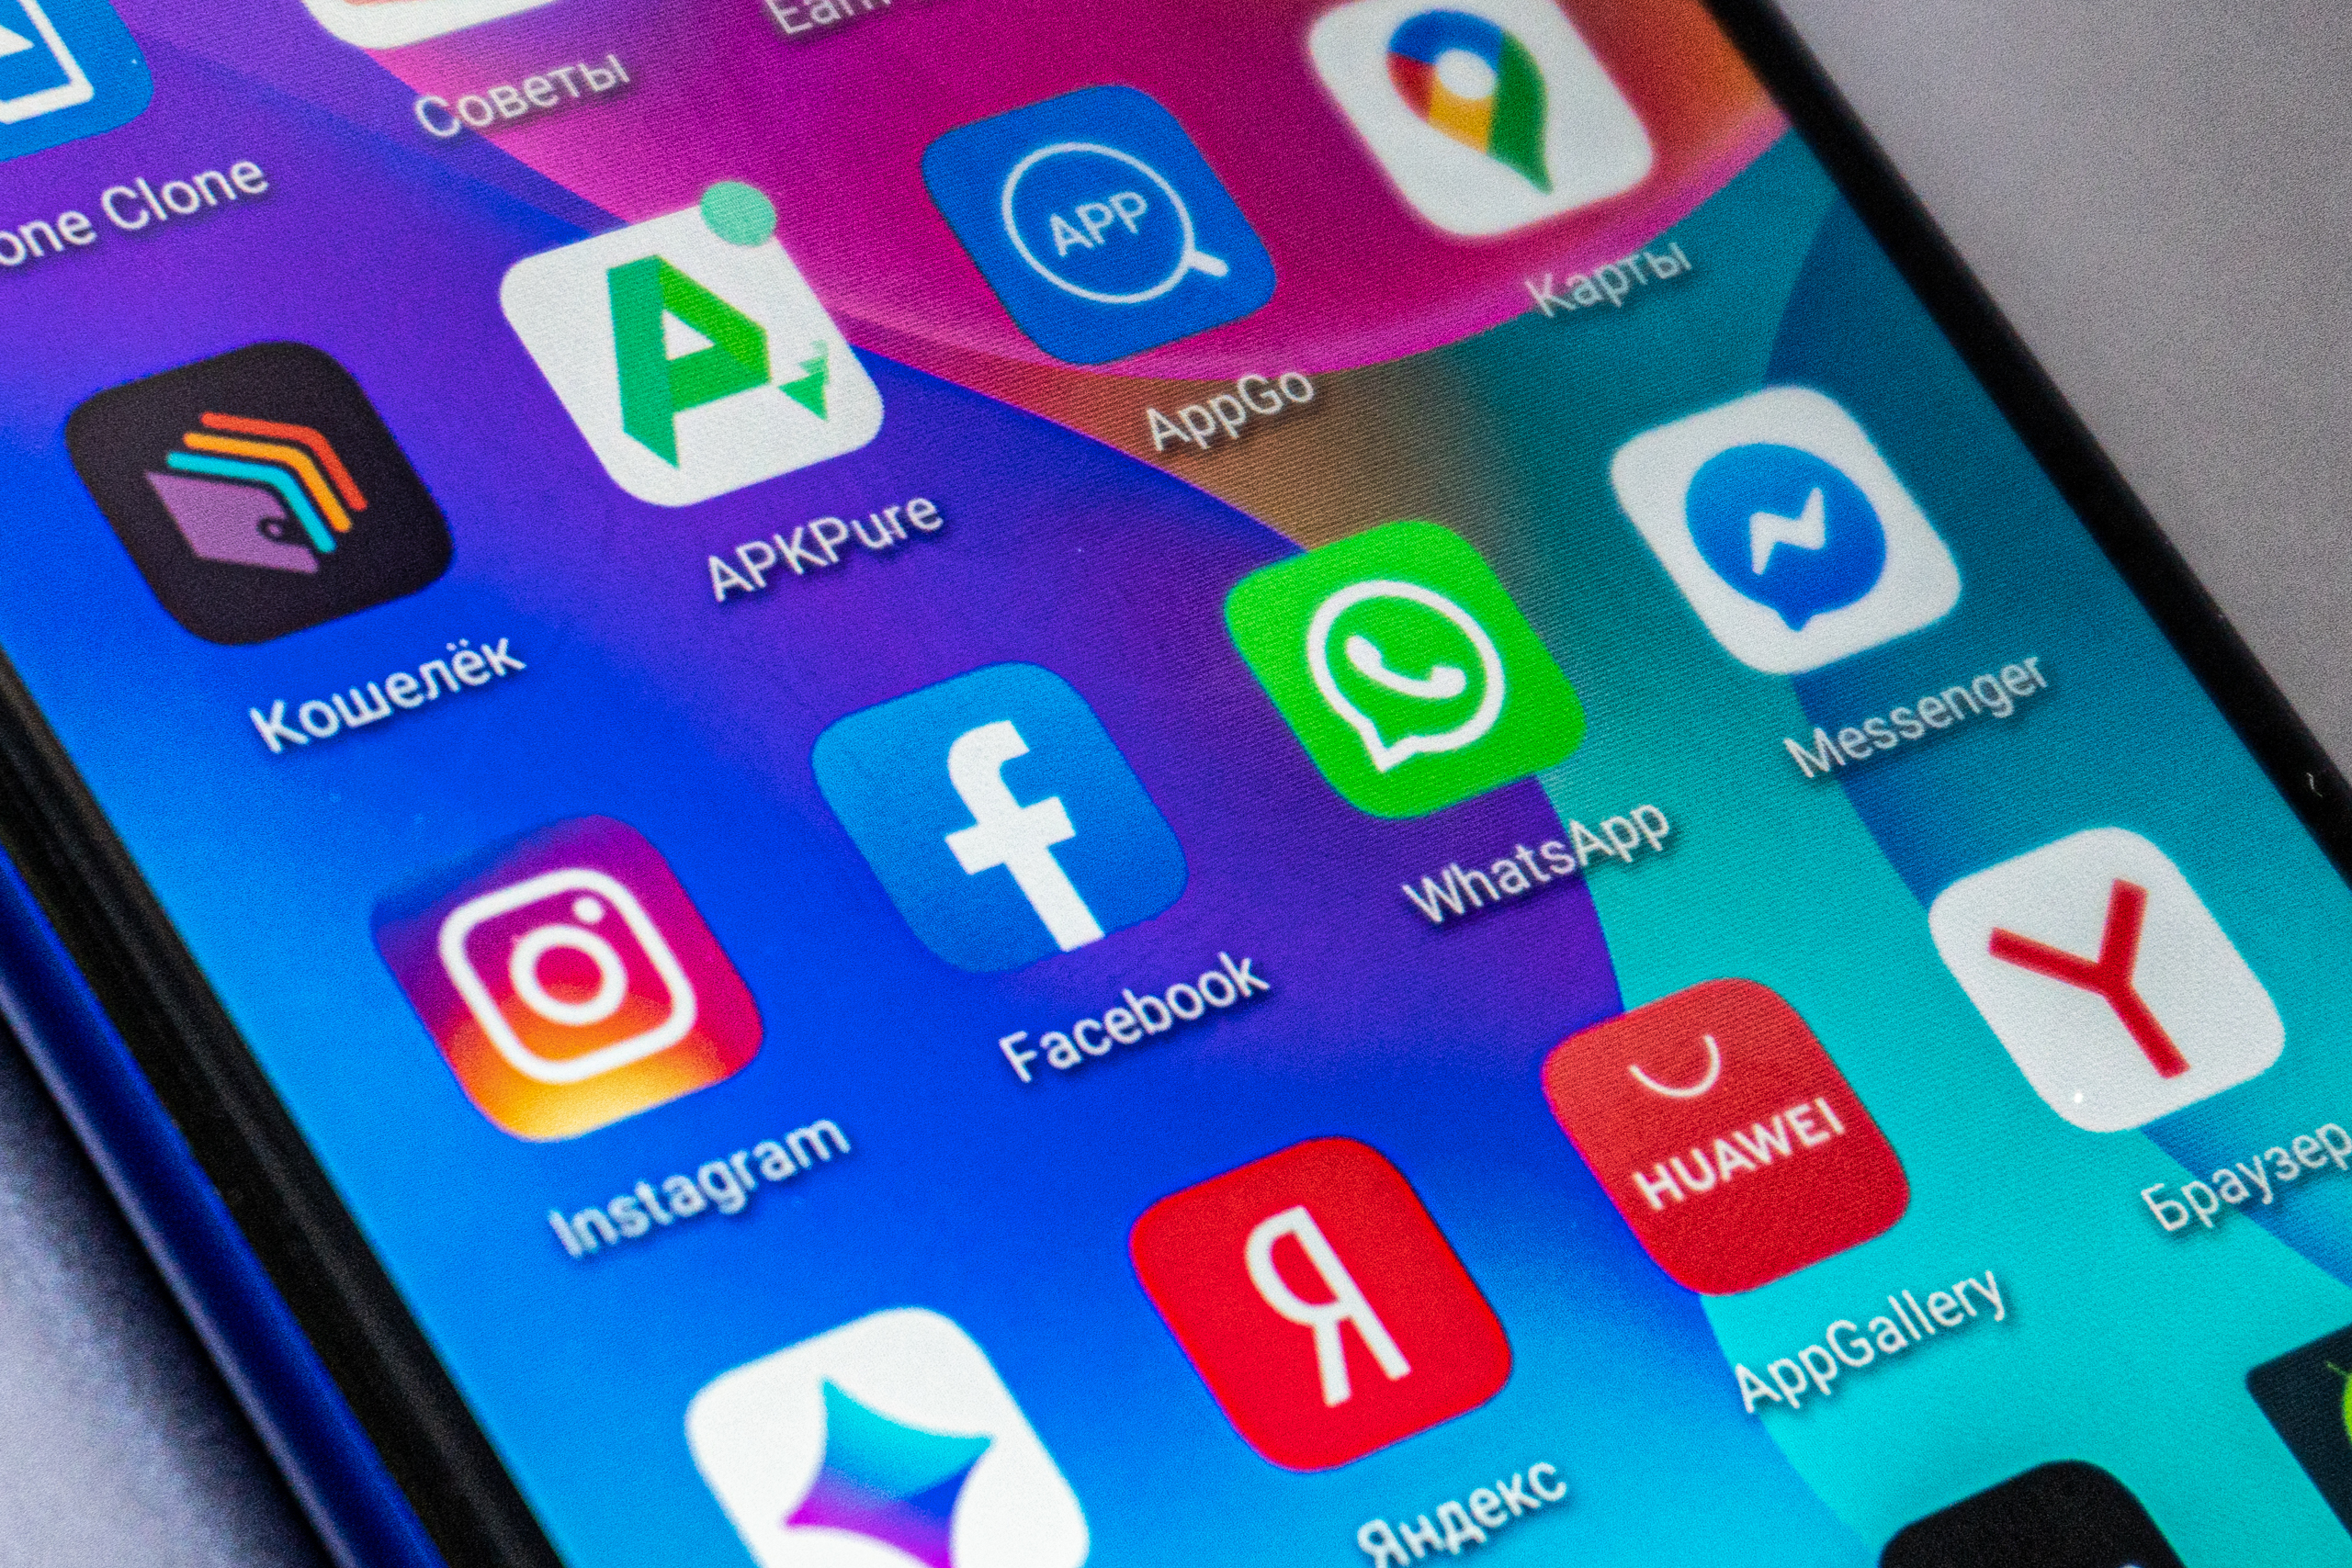 Подборка устройств huawei и honor 2020 года без поддержки google сервисов. | android tools